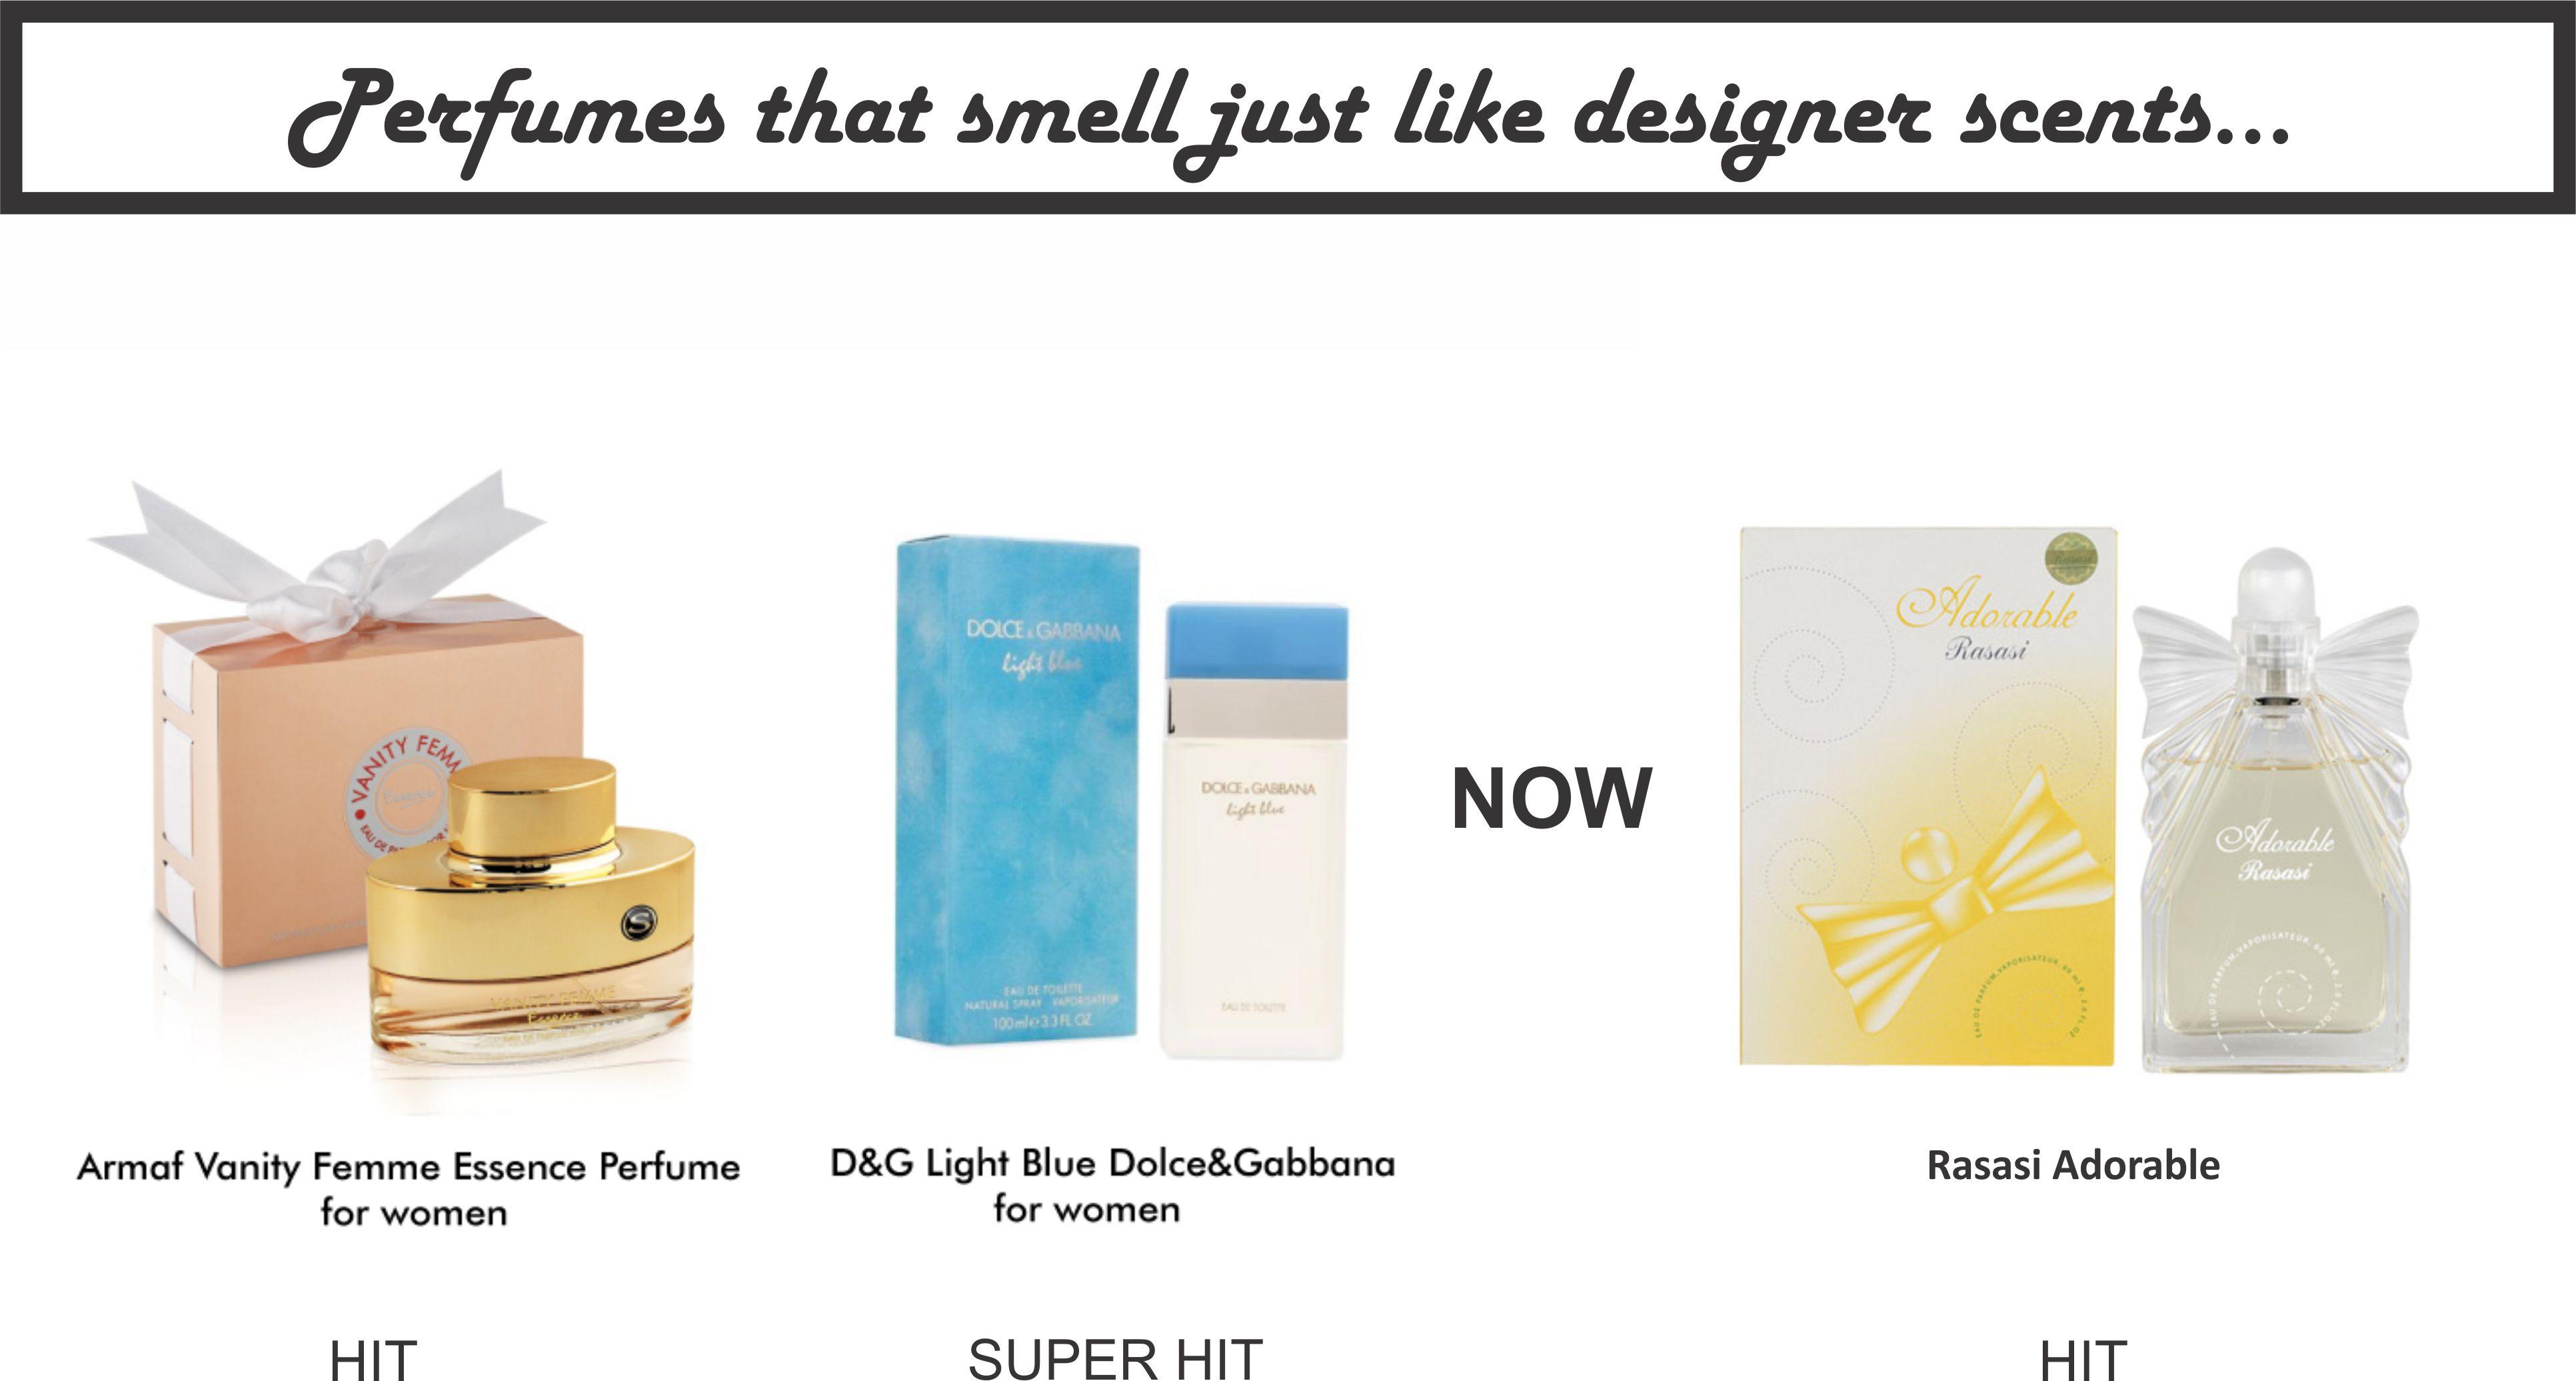 armaf-vanity-femme-essence-perfume-d&g-light-blue-dolce-&-gabbana-riiffs-la-femme-bloom-for-men-perfume-for-women